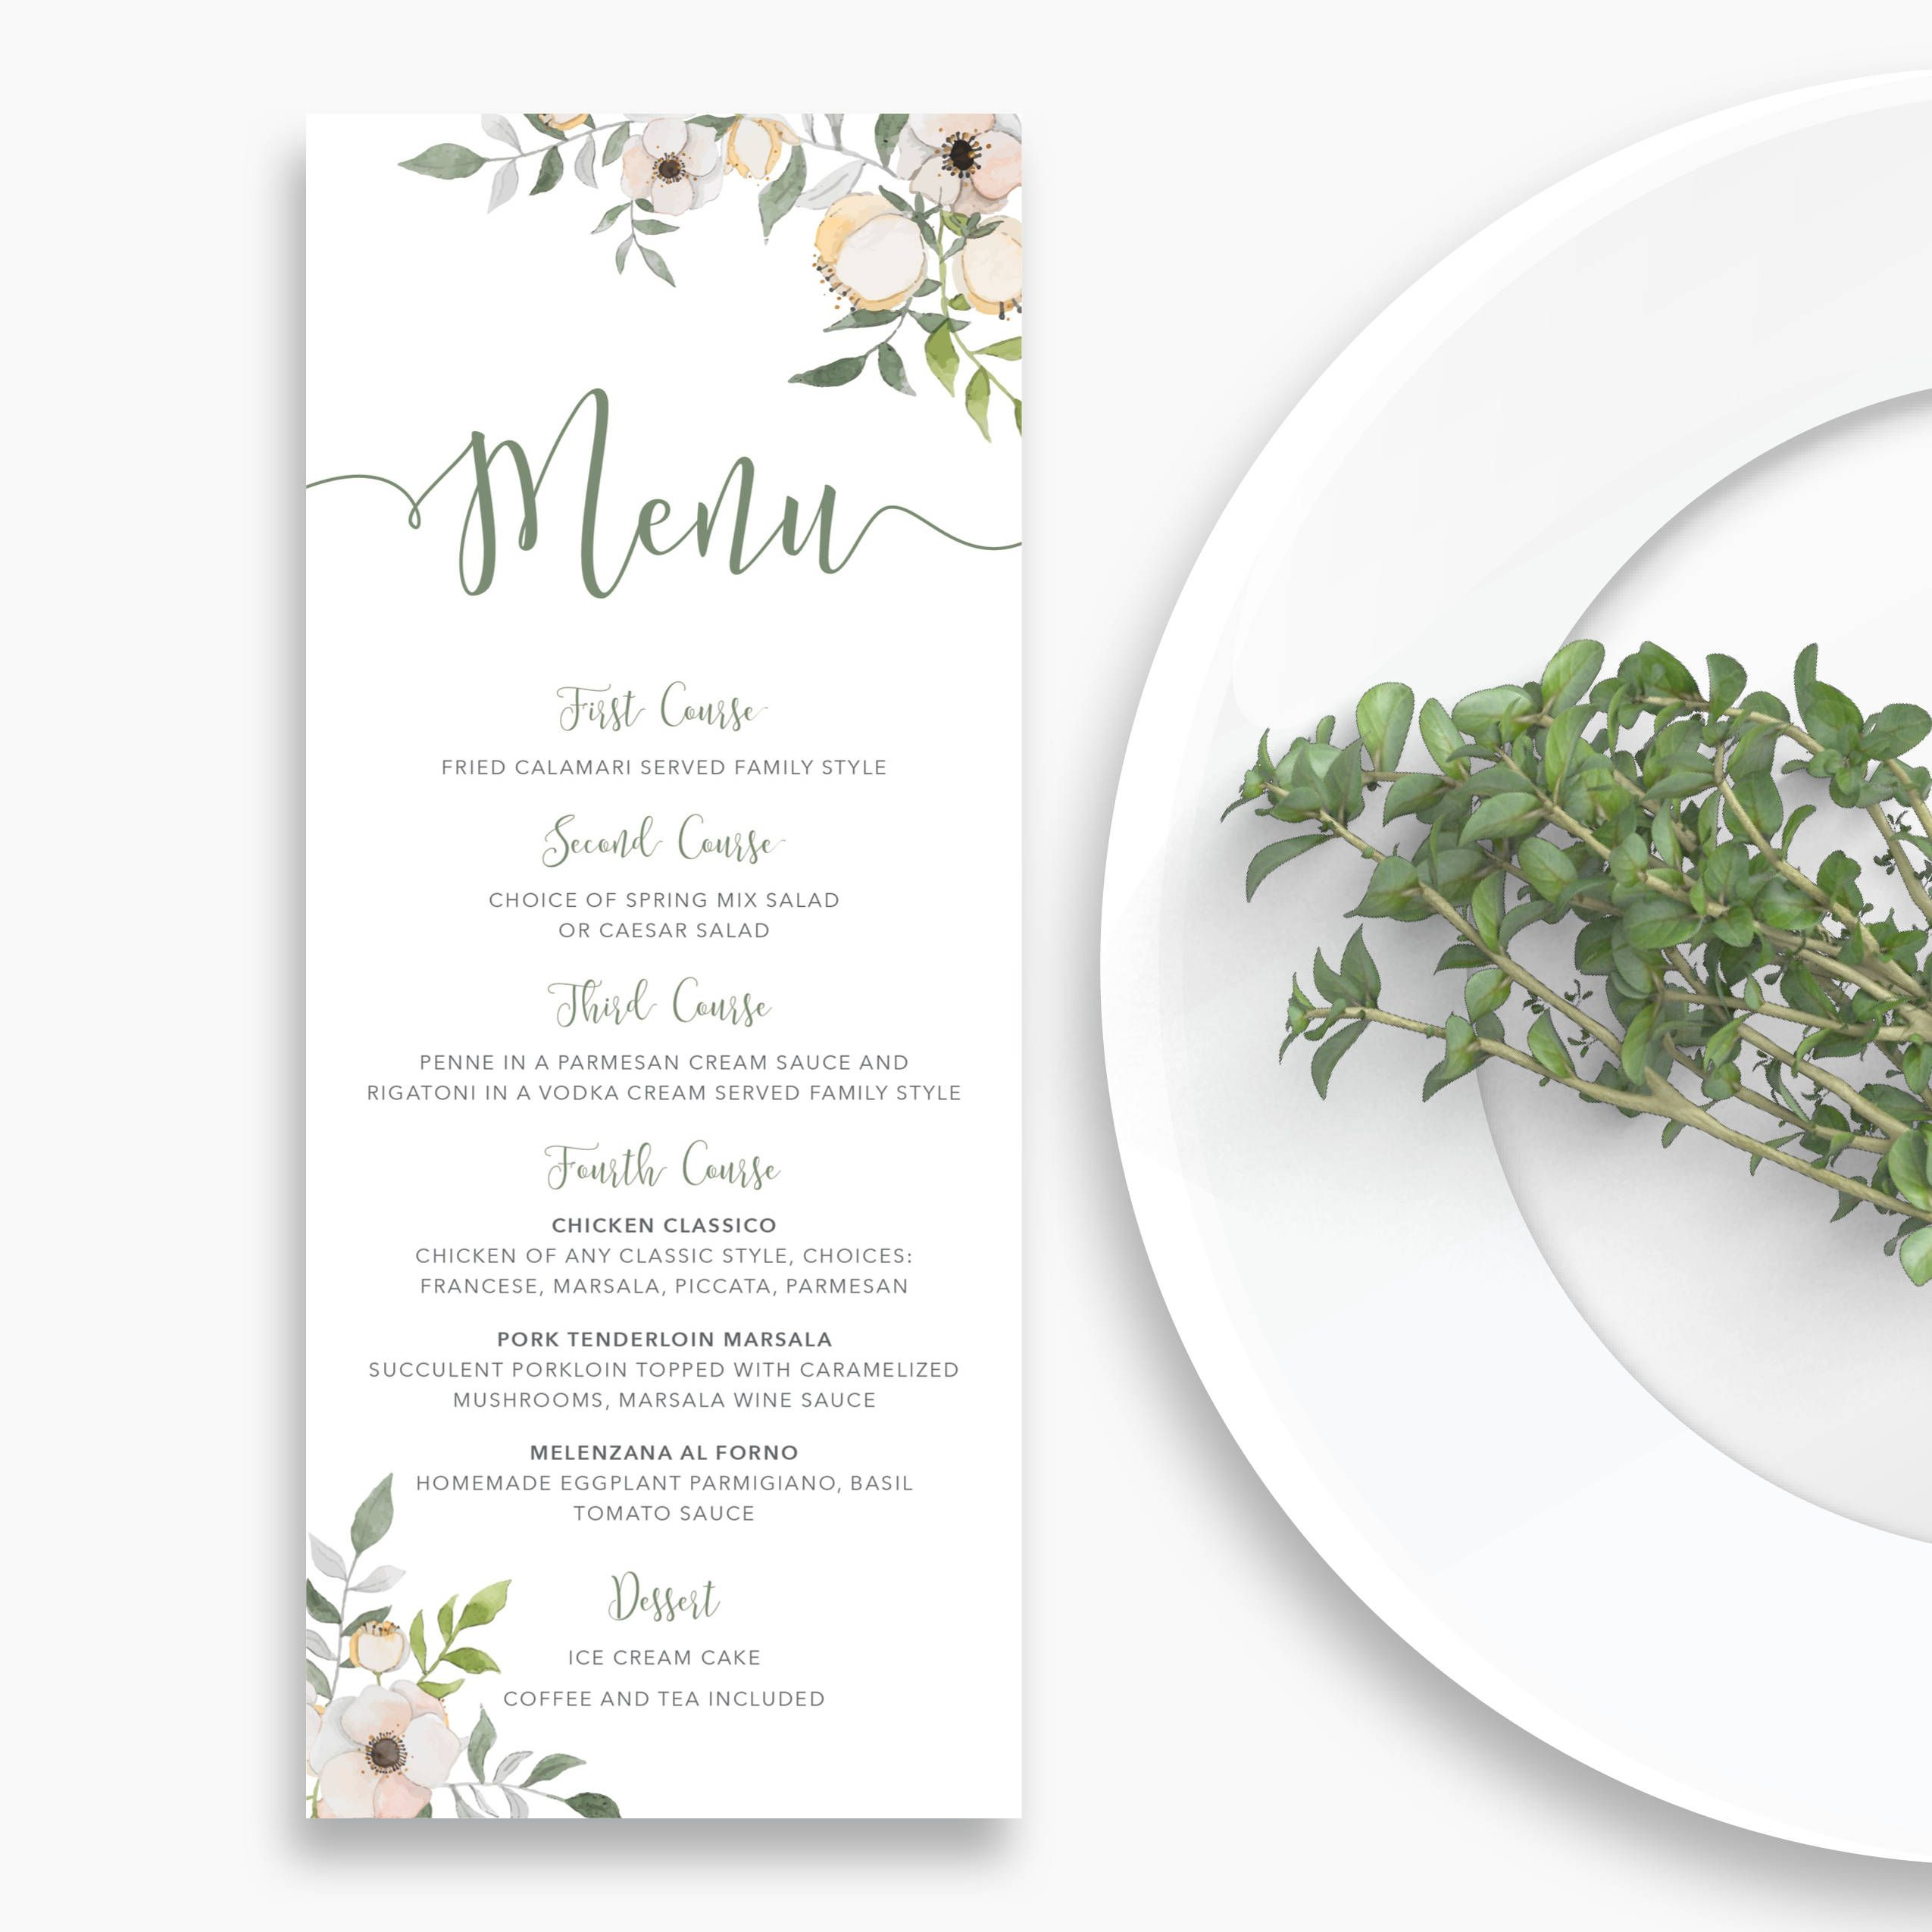 4X9375 Floral Wedding Food Menu Card Design